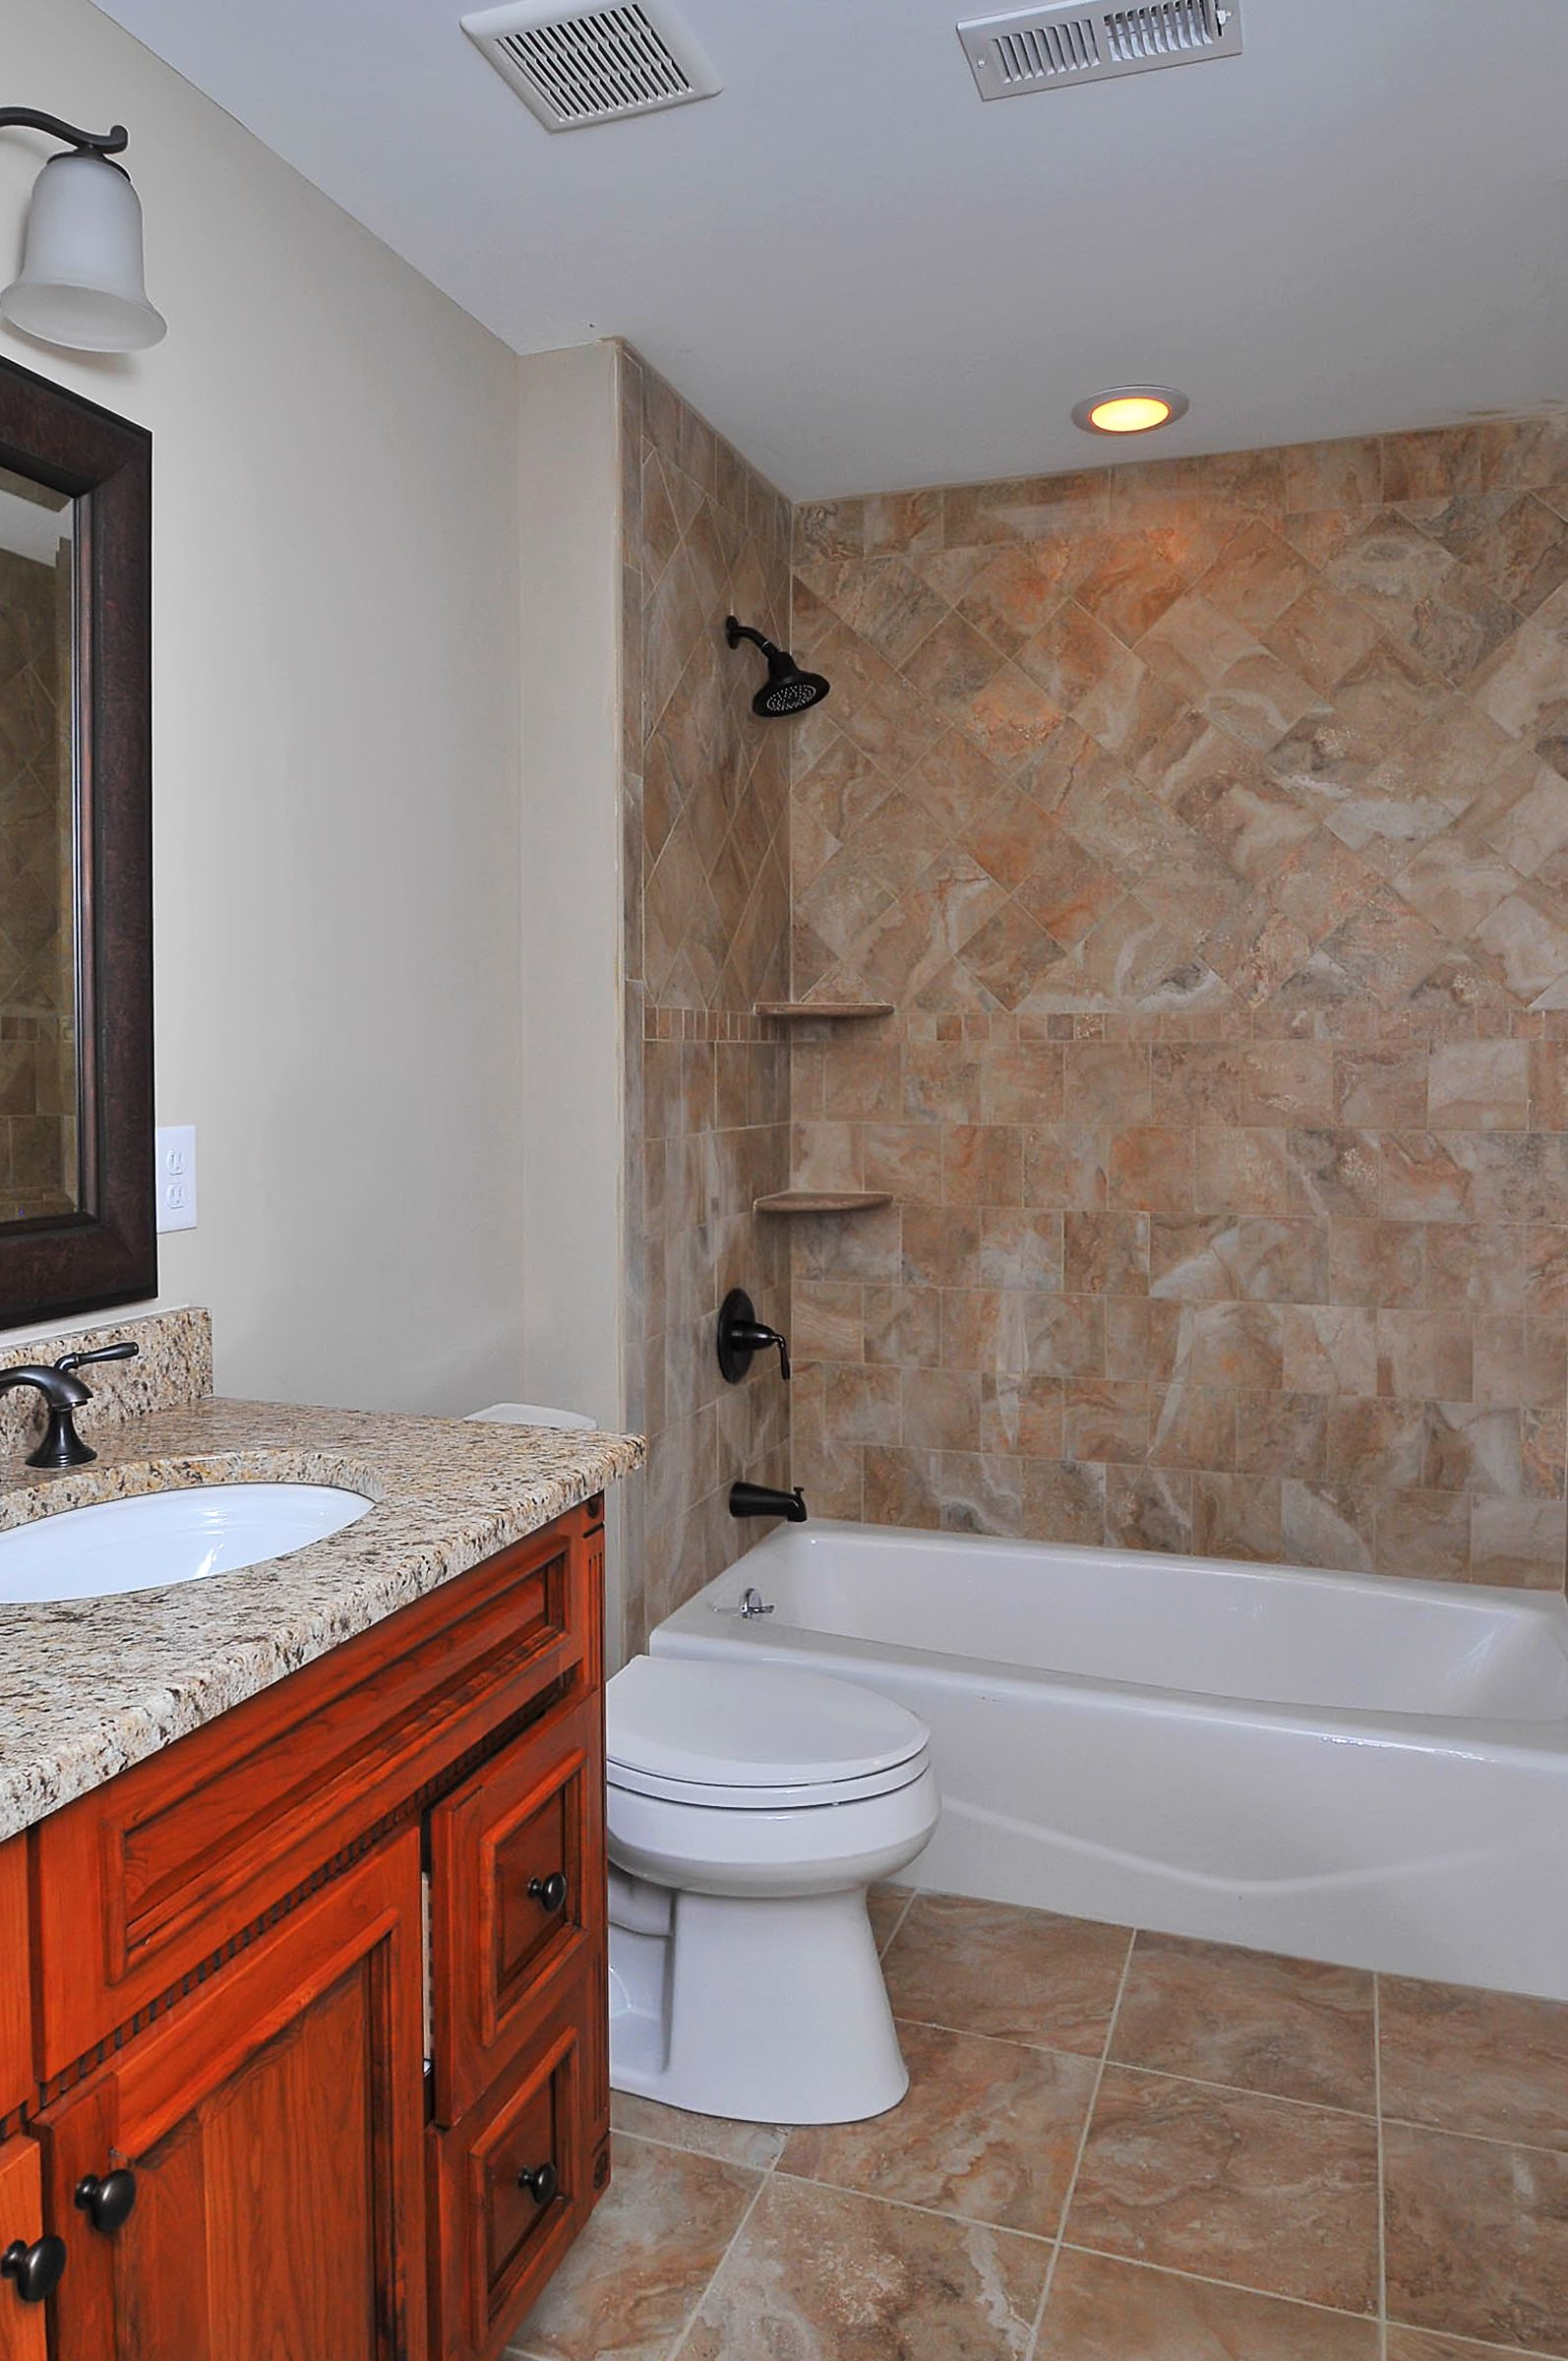 112 N. Florence Hall Bathroom II